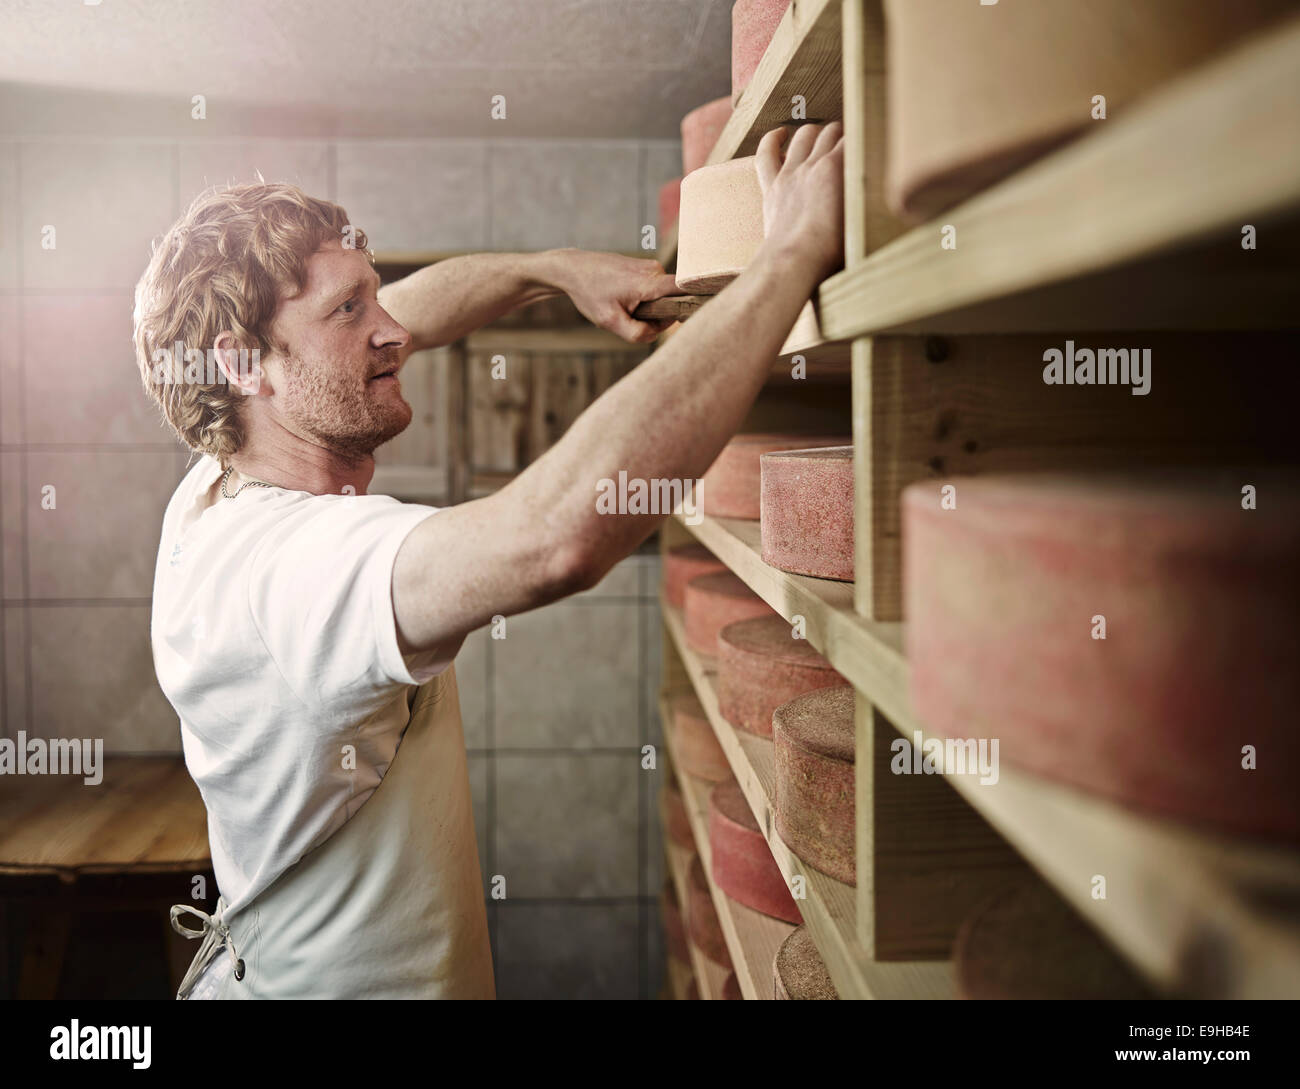 Dairyman stocker ses fromages de montagne, Steinbergalm, Inneralpbach, Alpbach, Tyrol, Autriche Photo Stock